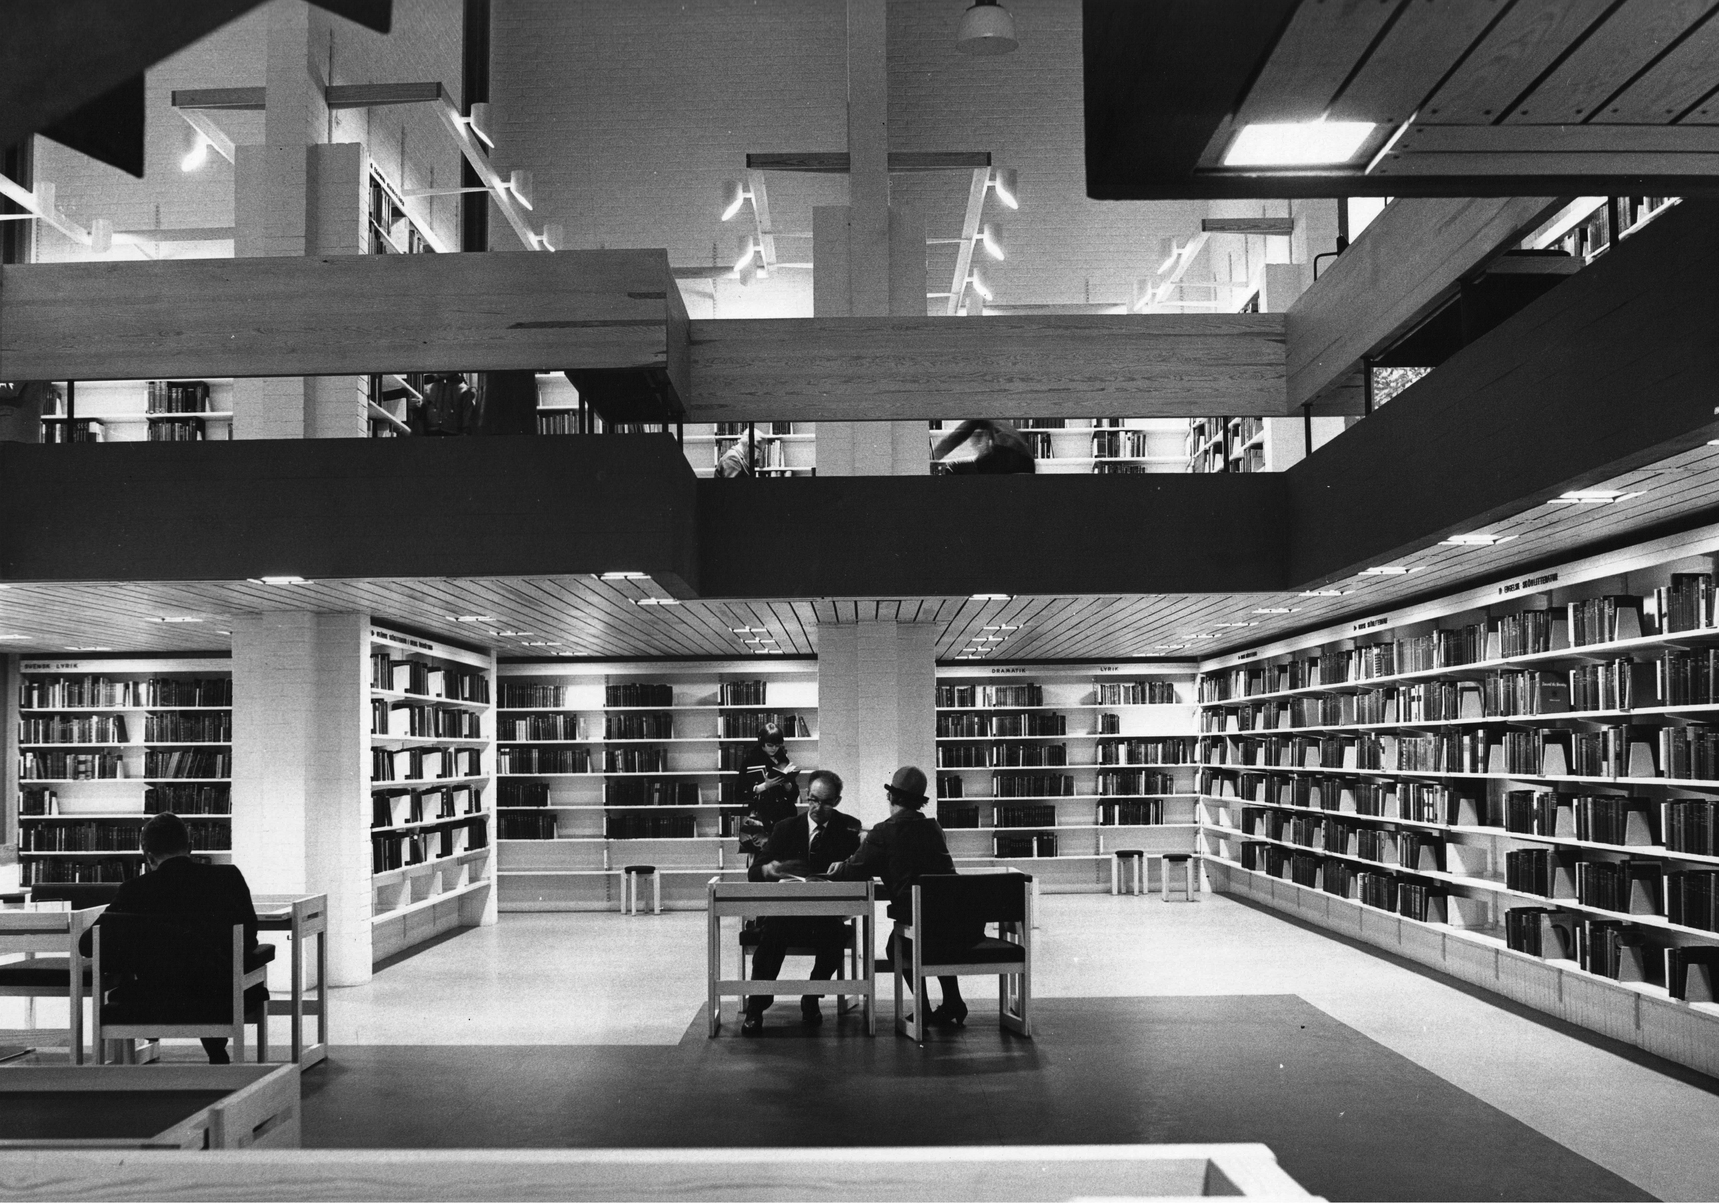 Svartvit bild på personer som läser inne i ett nybyggt bibliotek